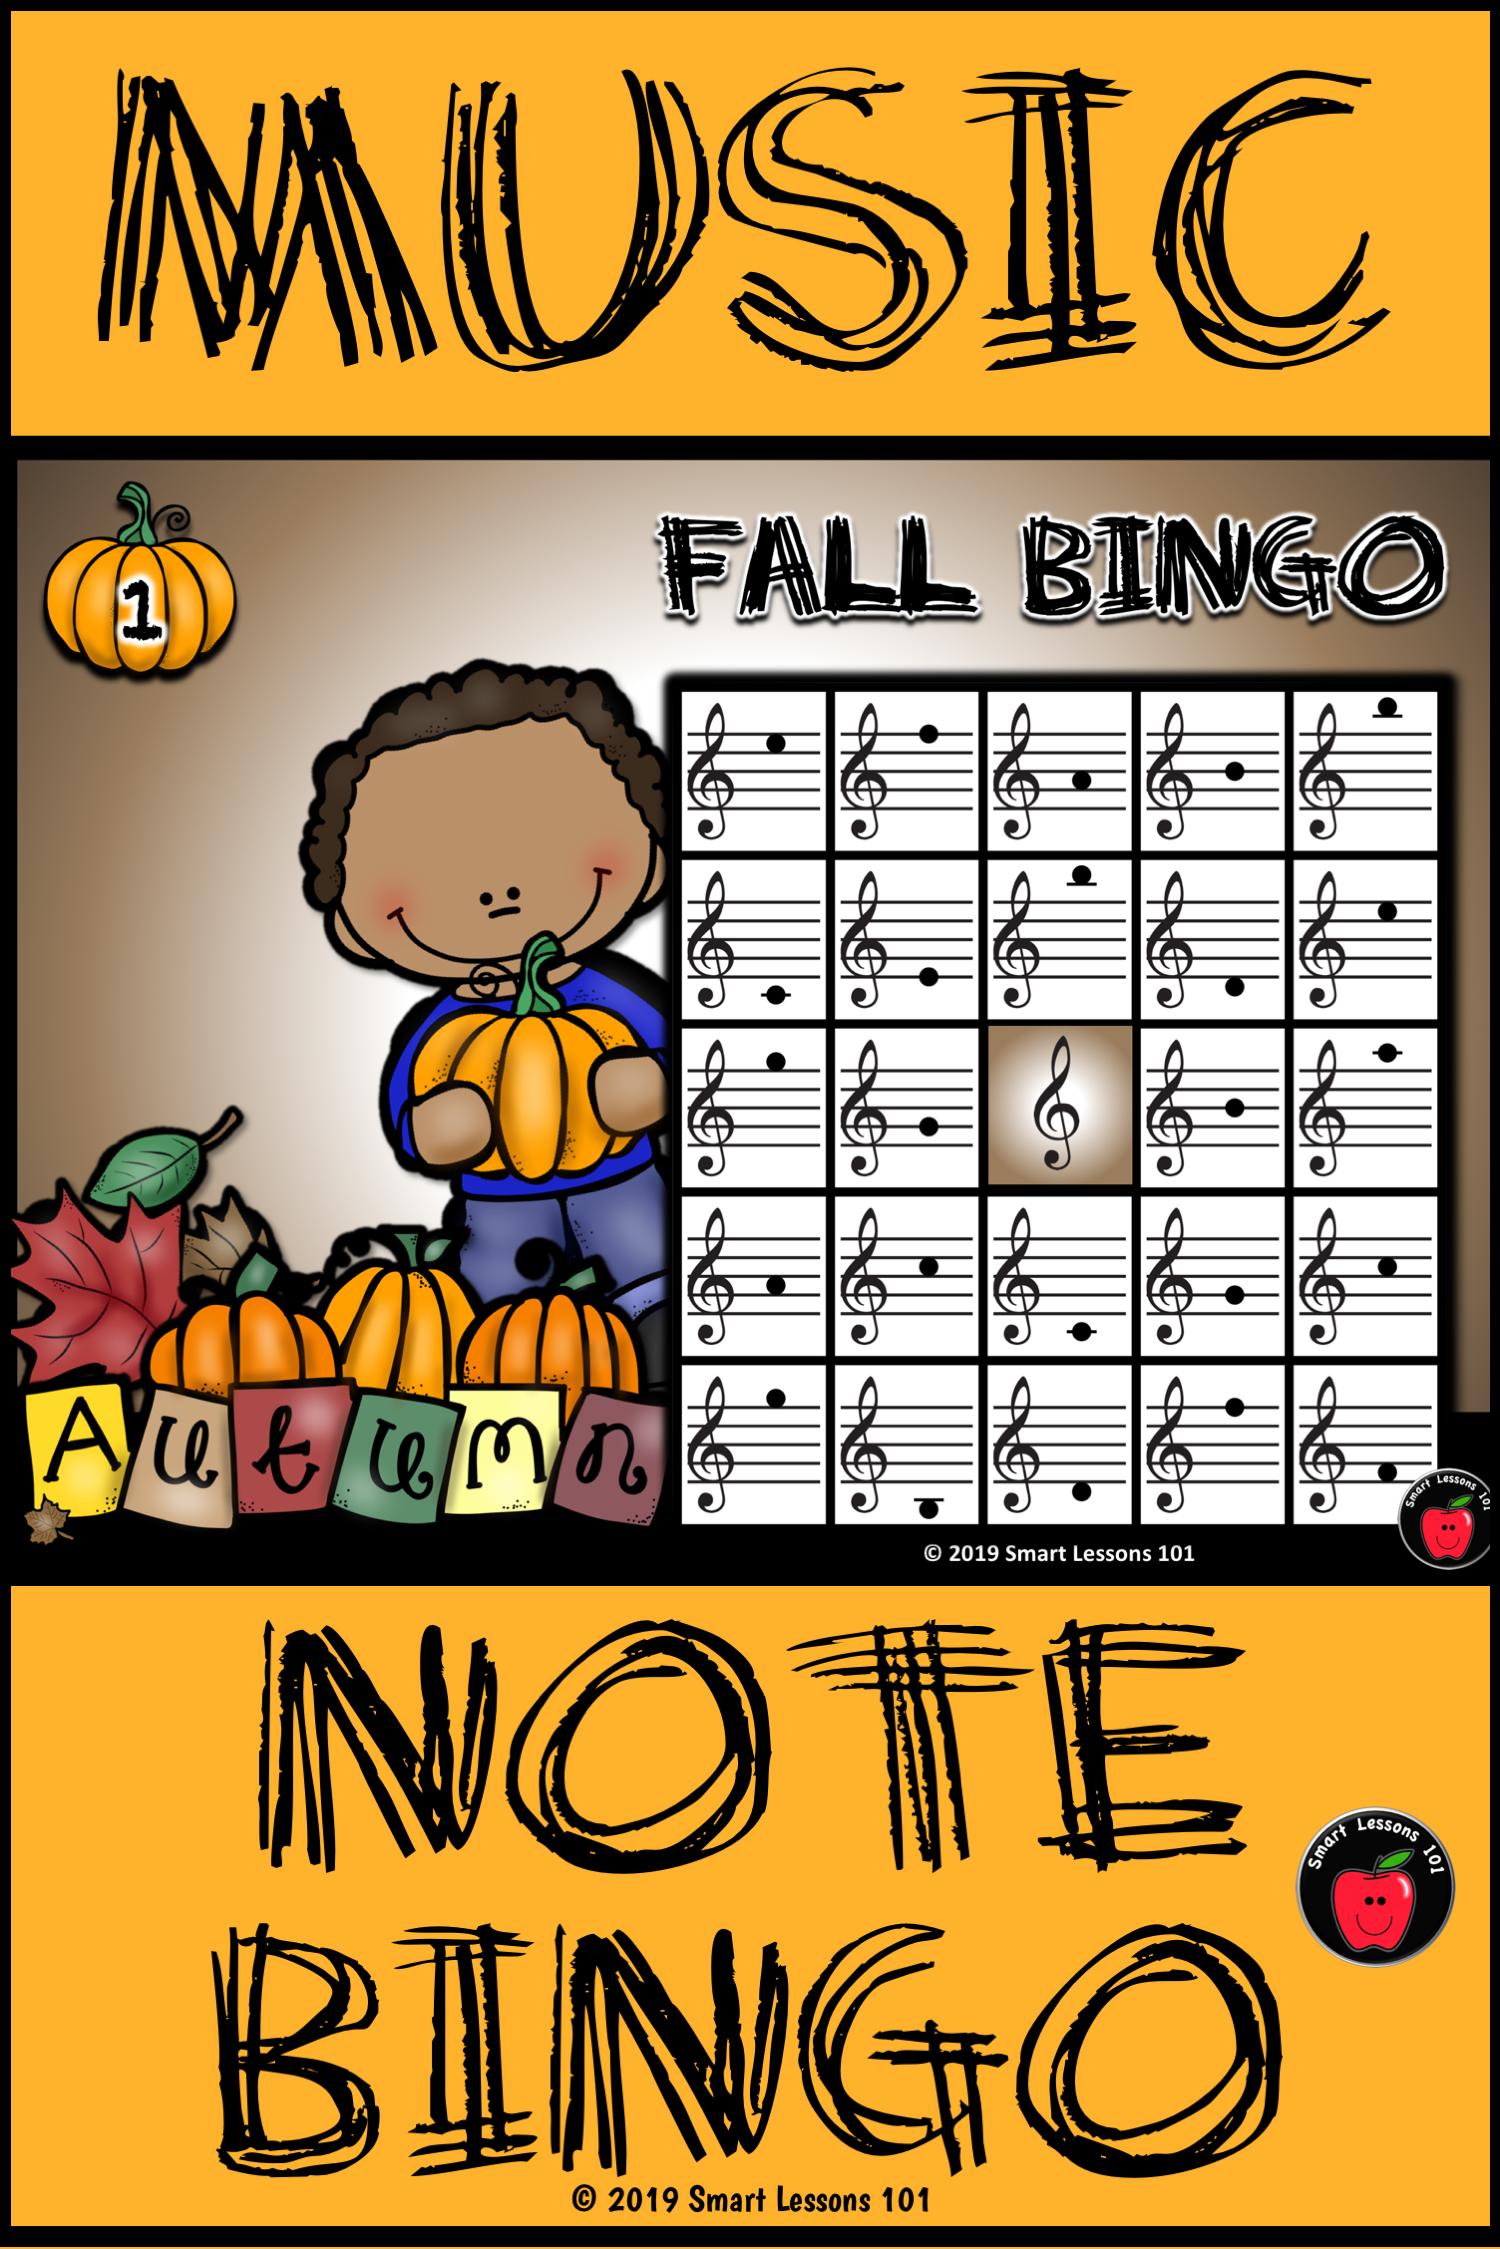 Fall Treble Clef Bingo Game Fall Note Name Bingo Fall